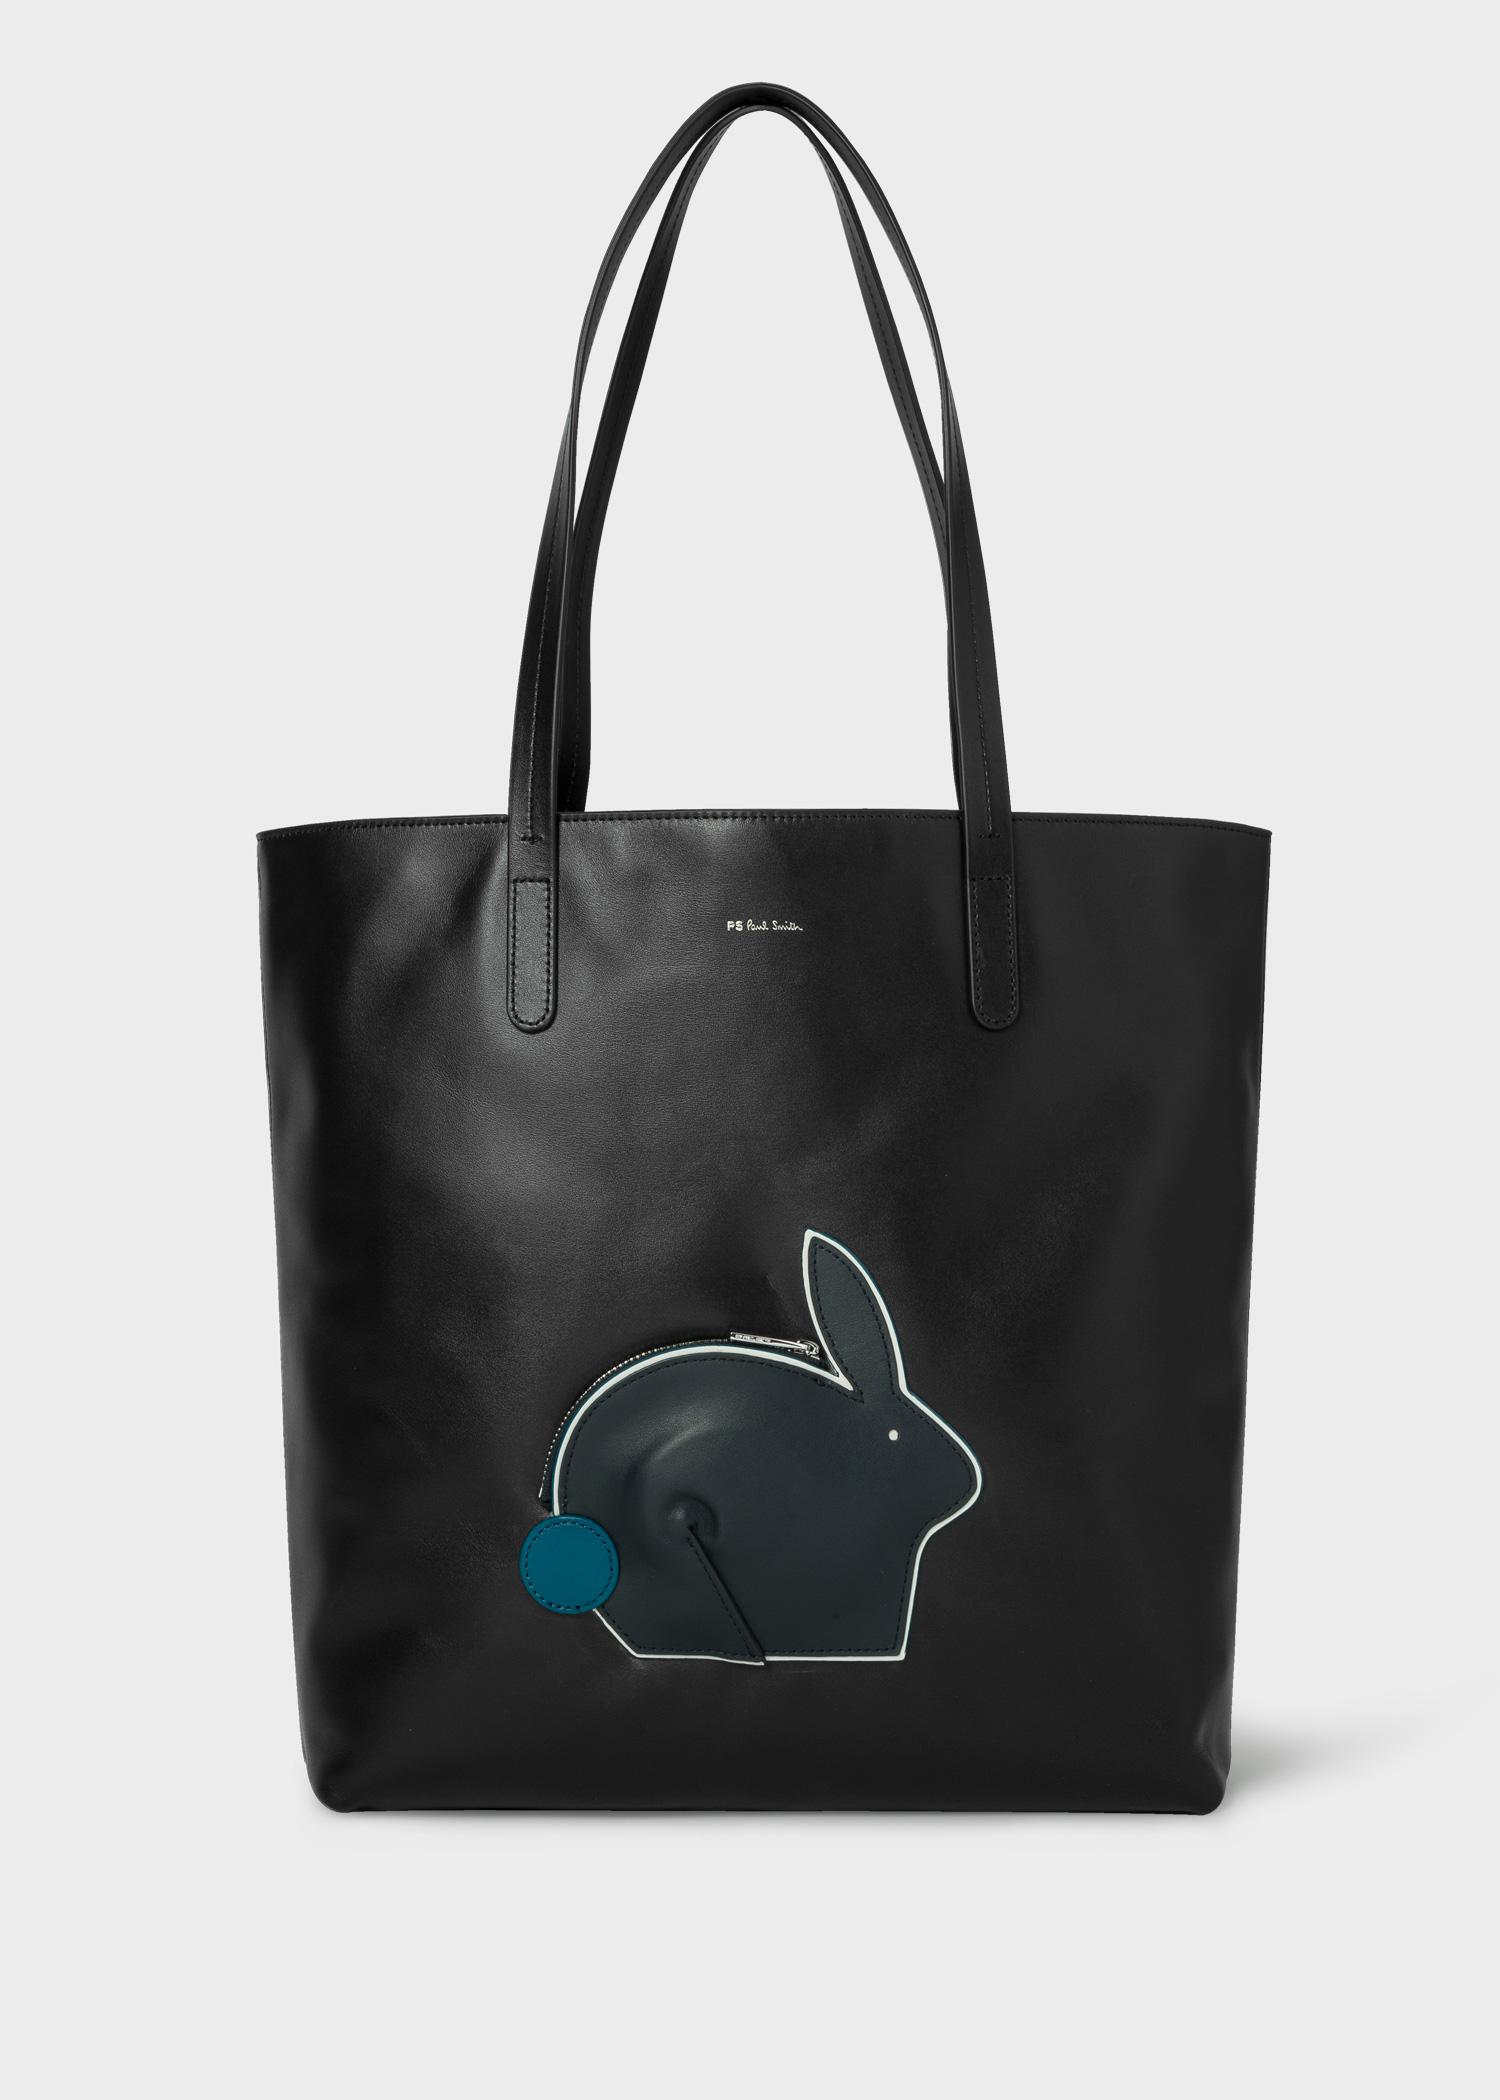 Womens Black Rabbit Pocket Leather Tote Bag Paul Smith Hong Kong